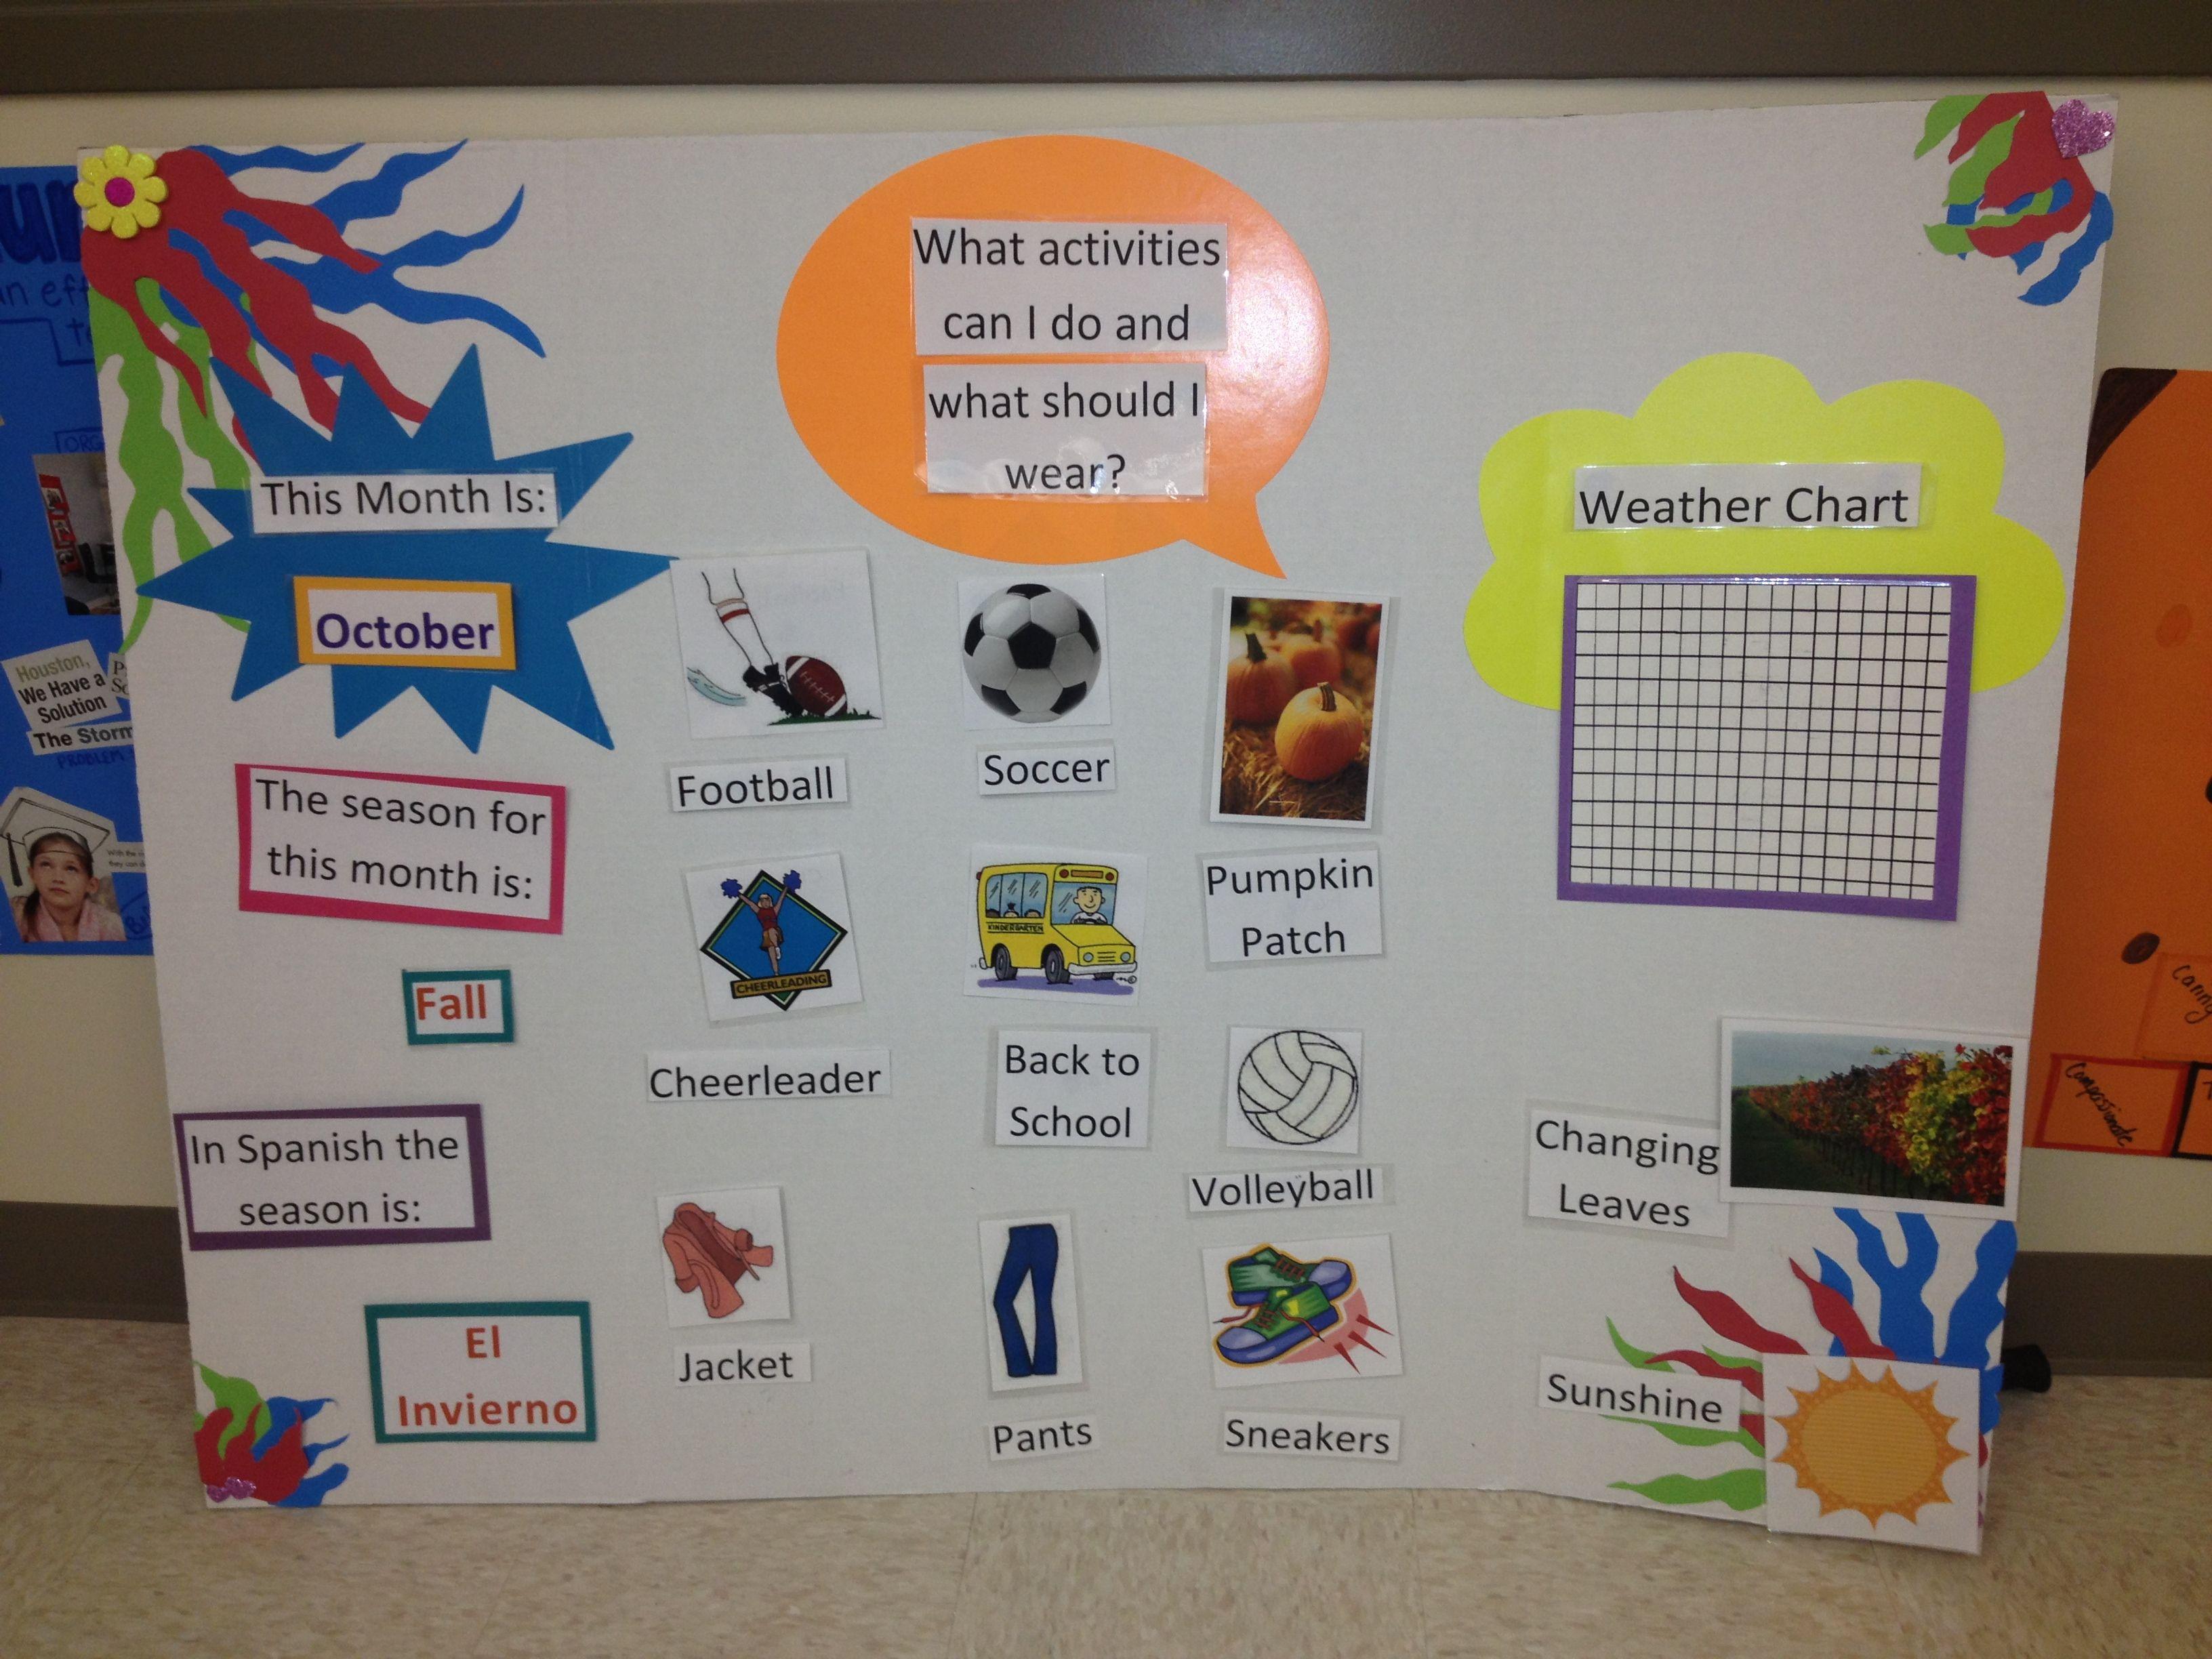 Weather Instructional Activity For Kindergarten Students